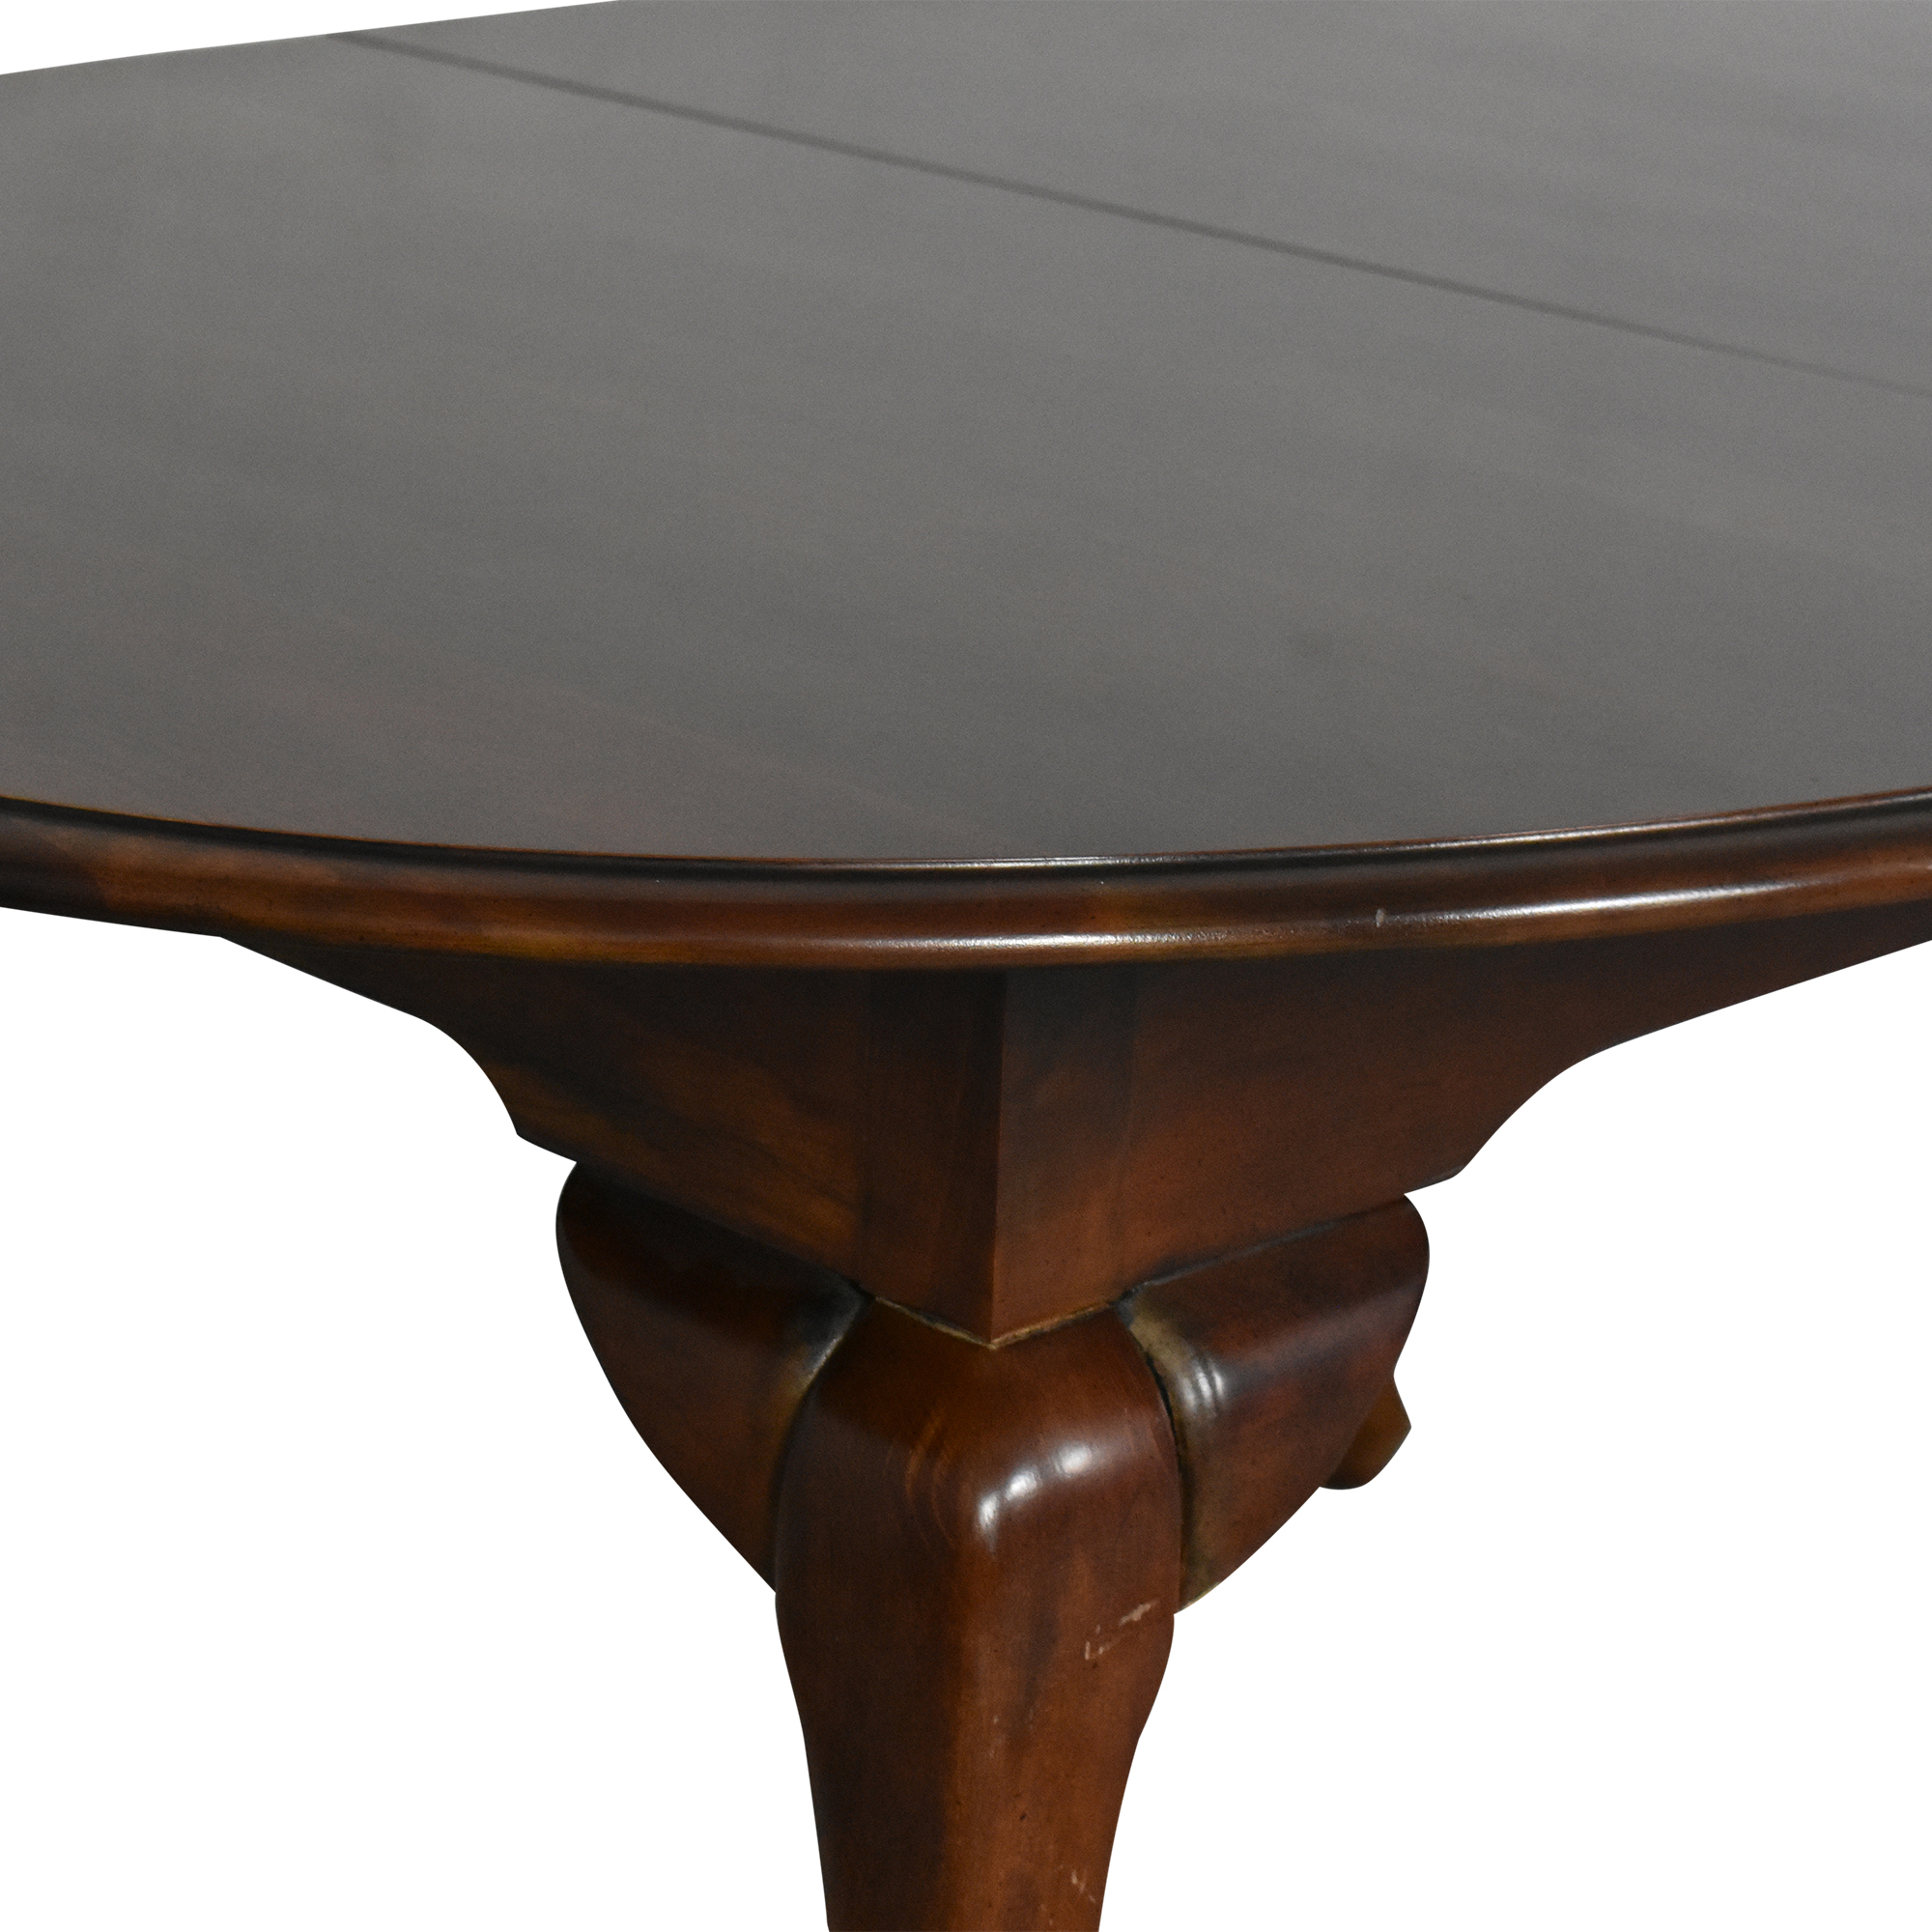 buy Drexel Heritage Drexel Heritage Queen Anne Dining Table online